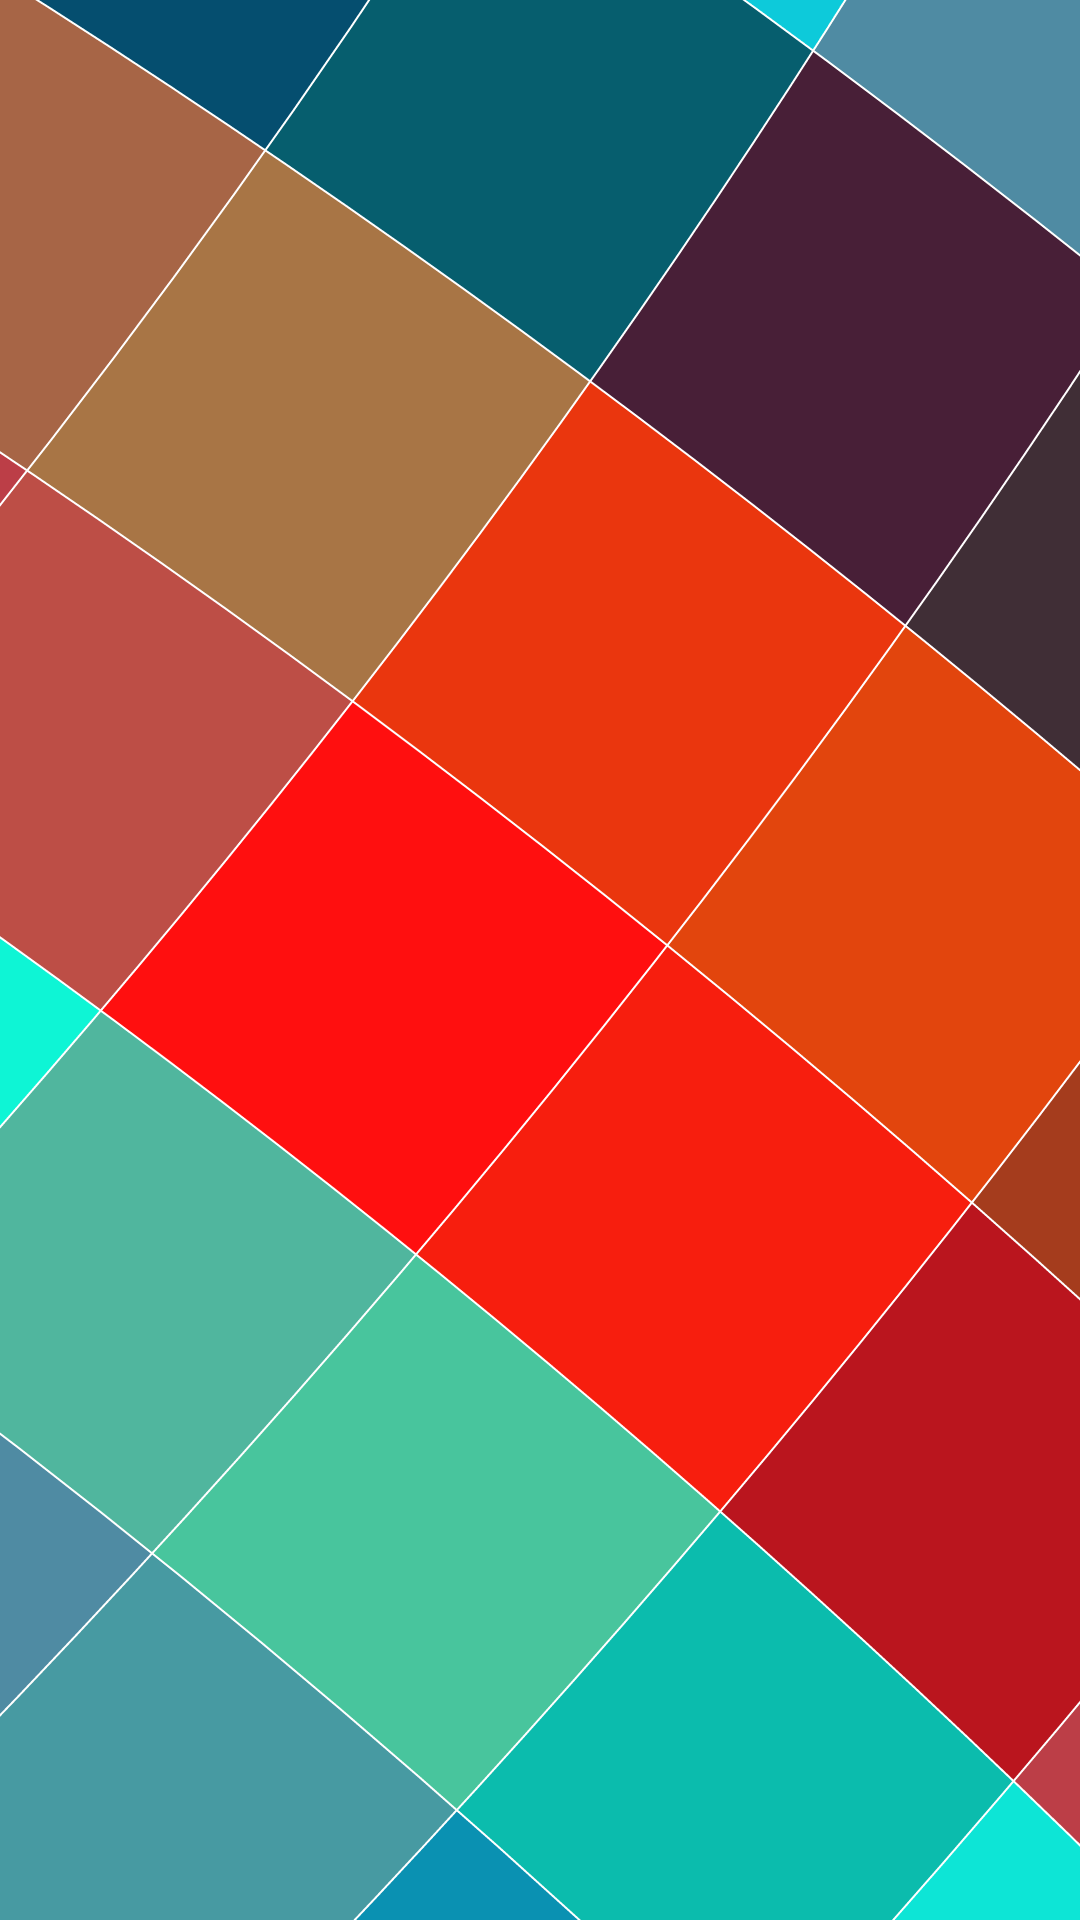 Carbon Wallpaper Iphone X Hd 1080 X 1920 Images Vertical Pixelstalk Net